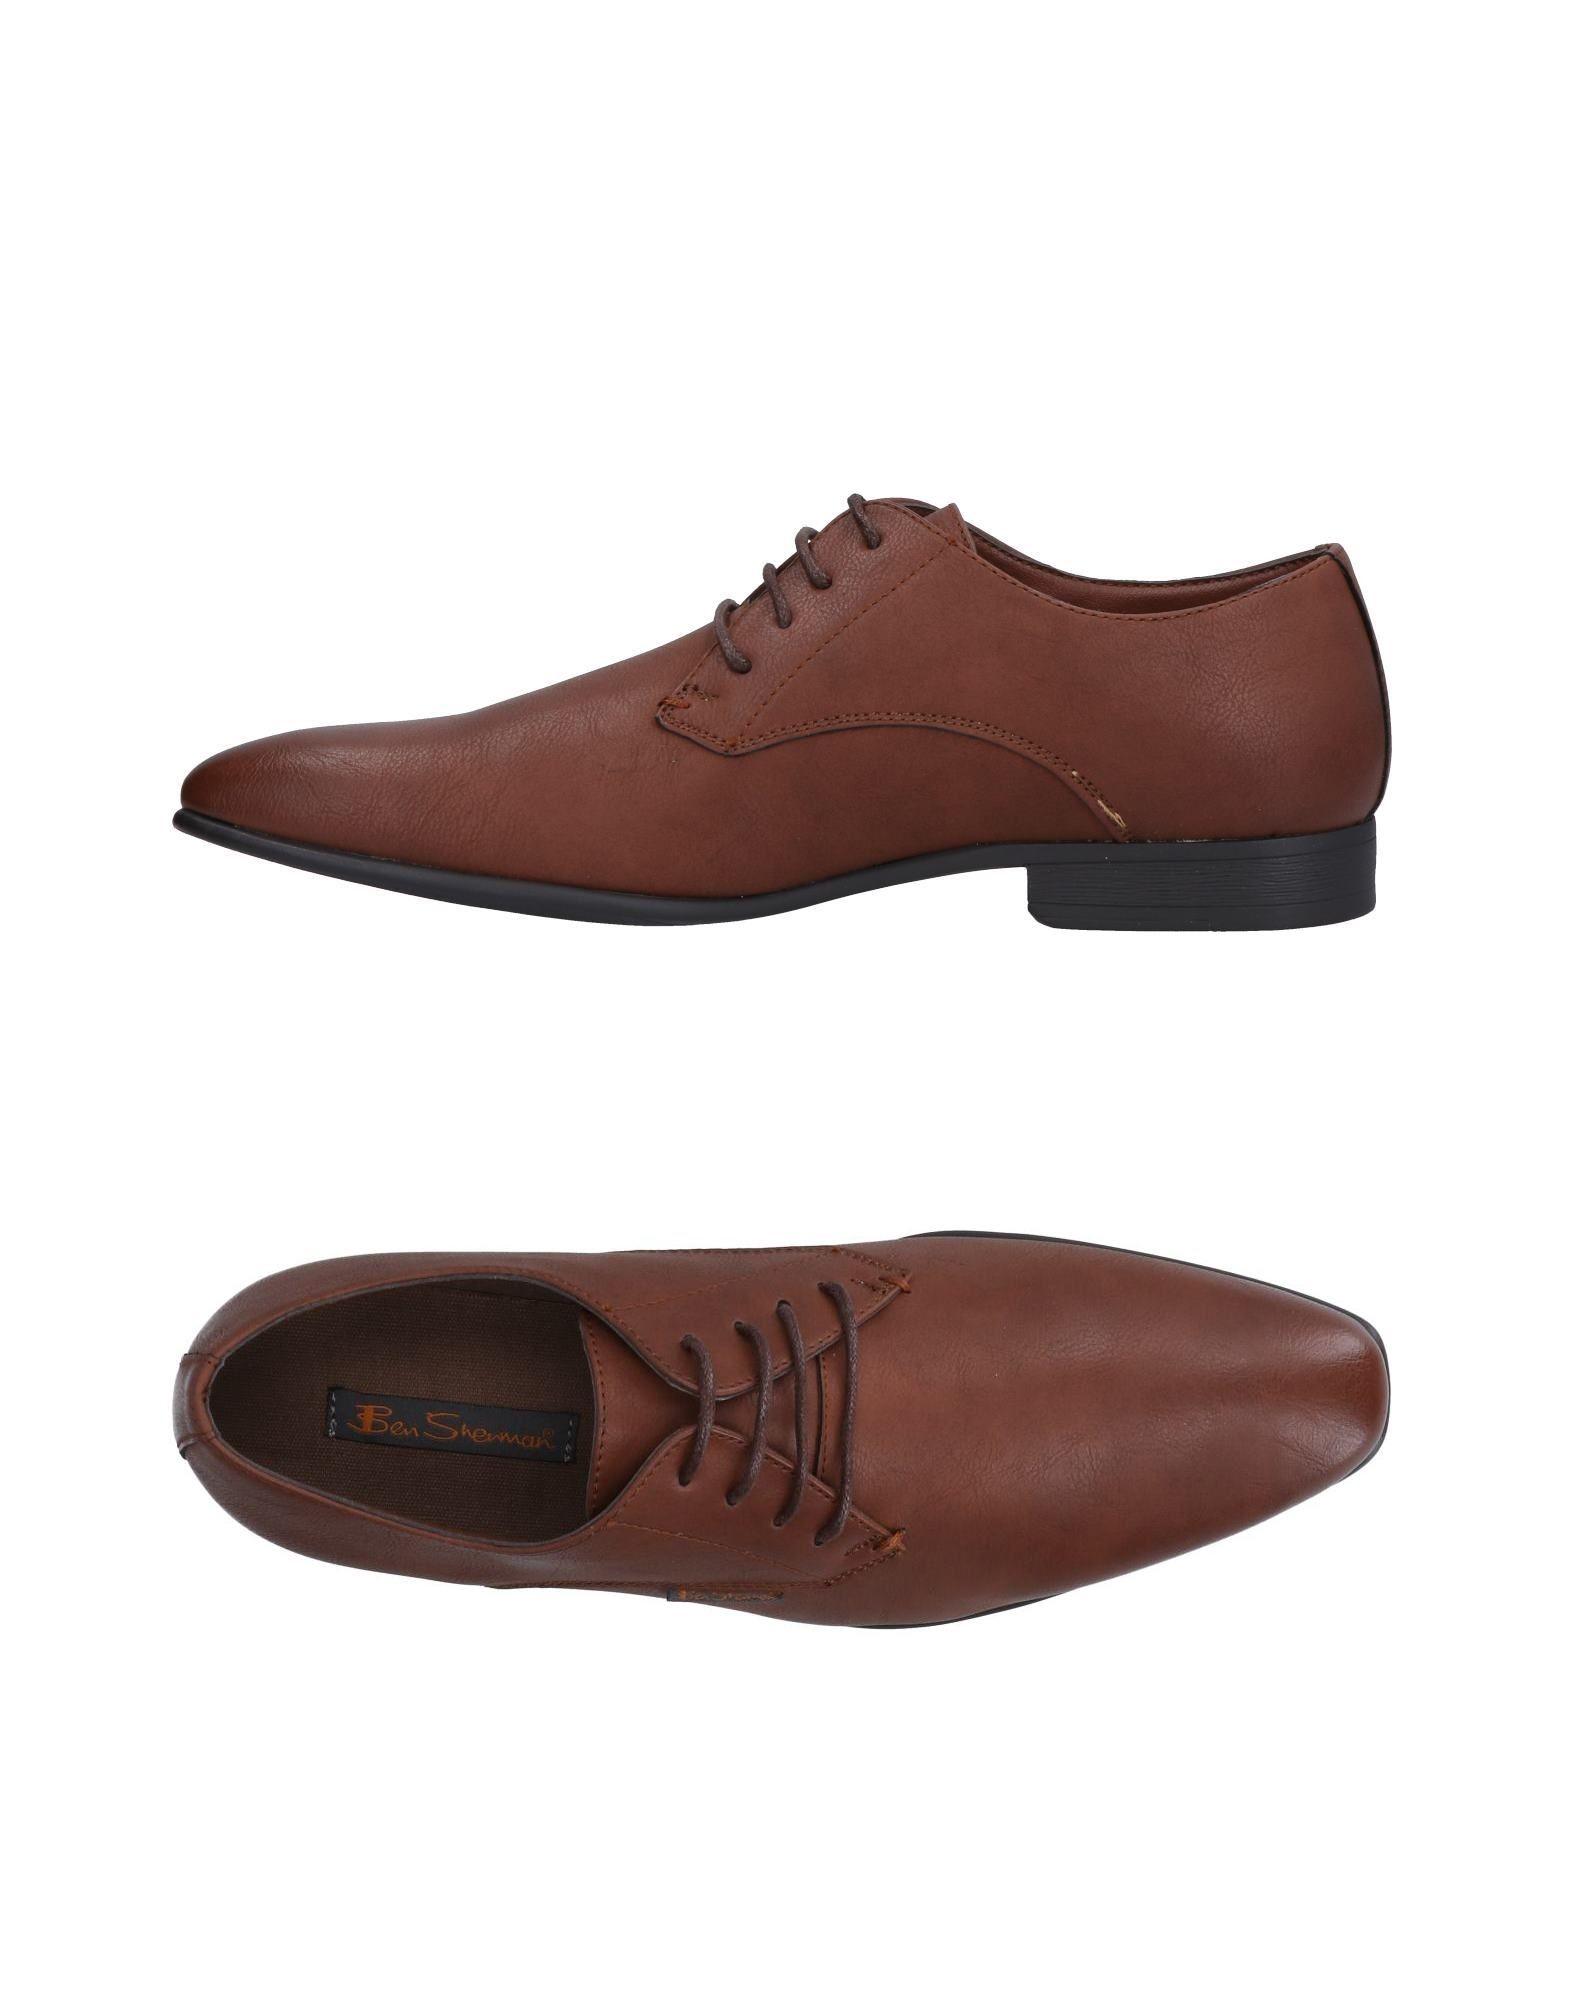 Rabatt echte Schuhe Schnürschuhe Ben Sherman Schnürschuhe Schuhe Herren 11510714LV 1b2323